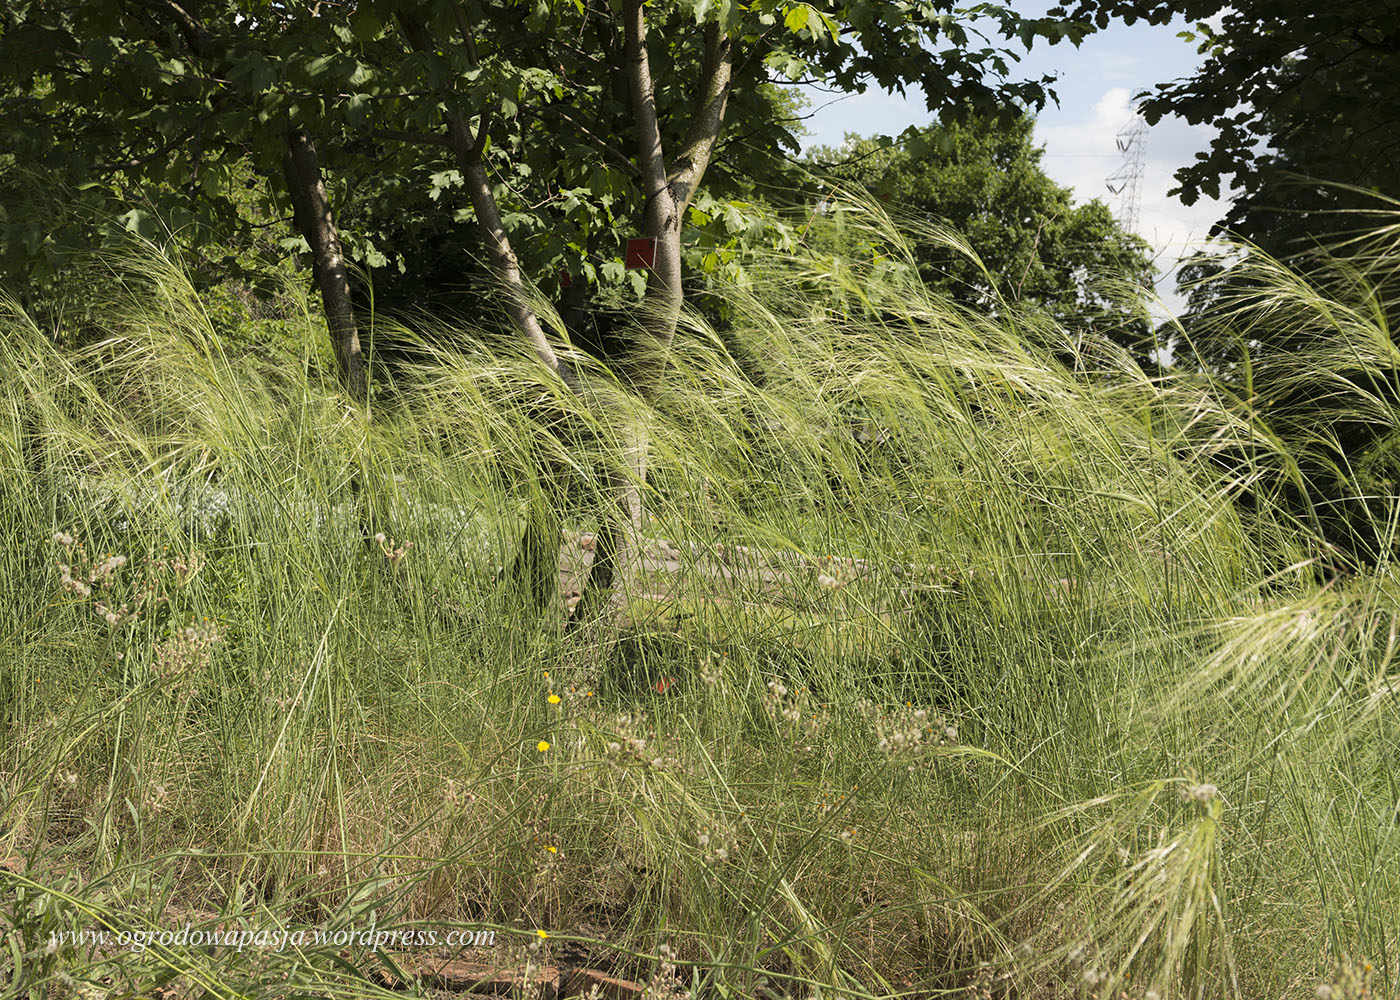 ostnica włosowata (stipa capillata)